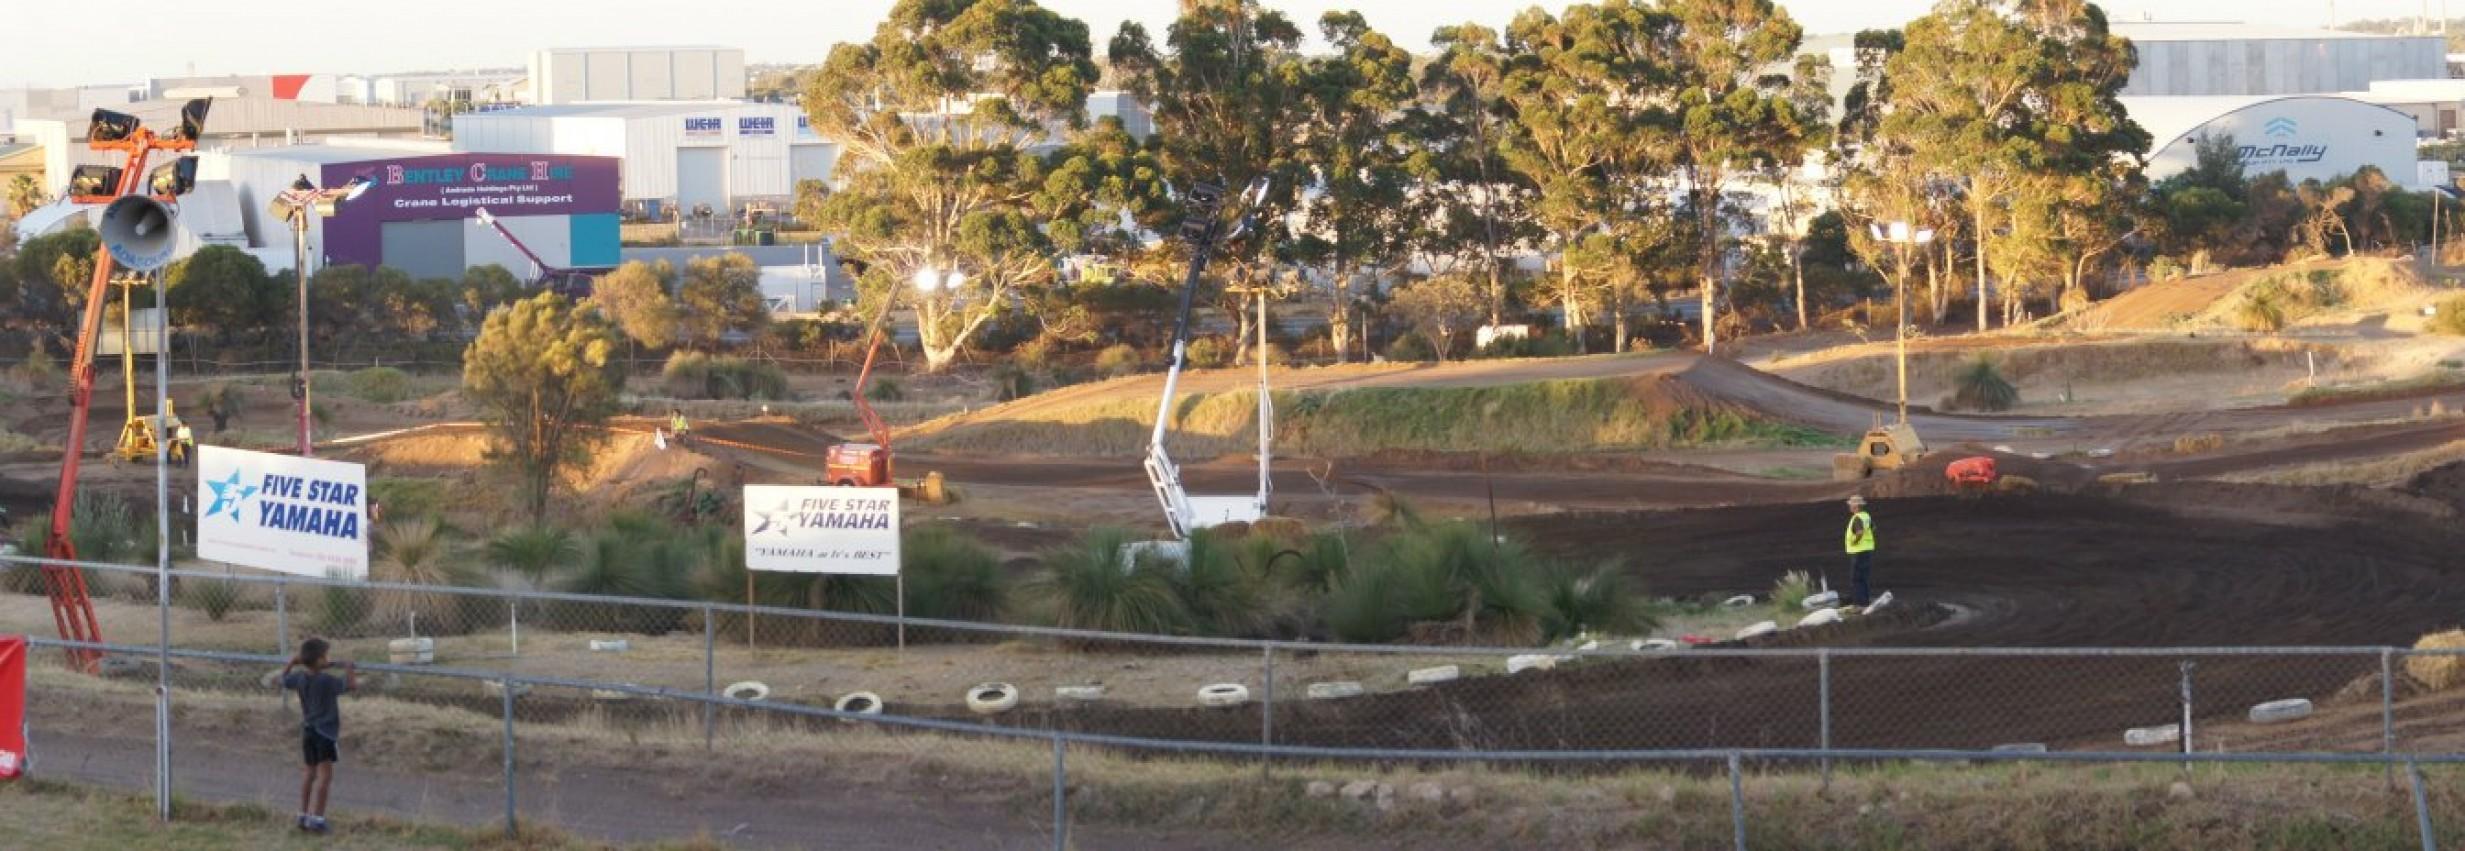 Coastal Park Motocross Track